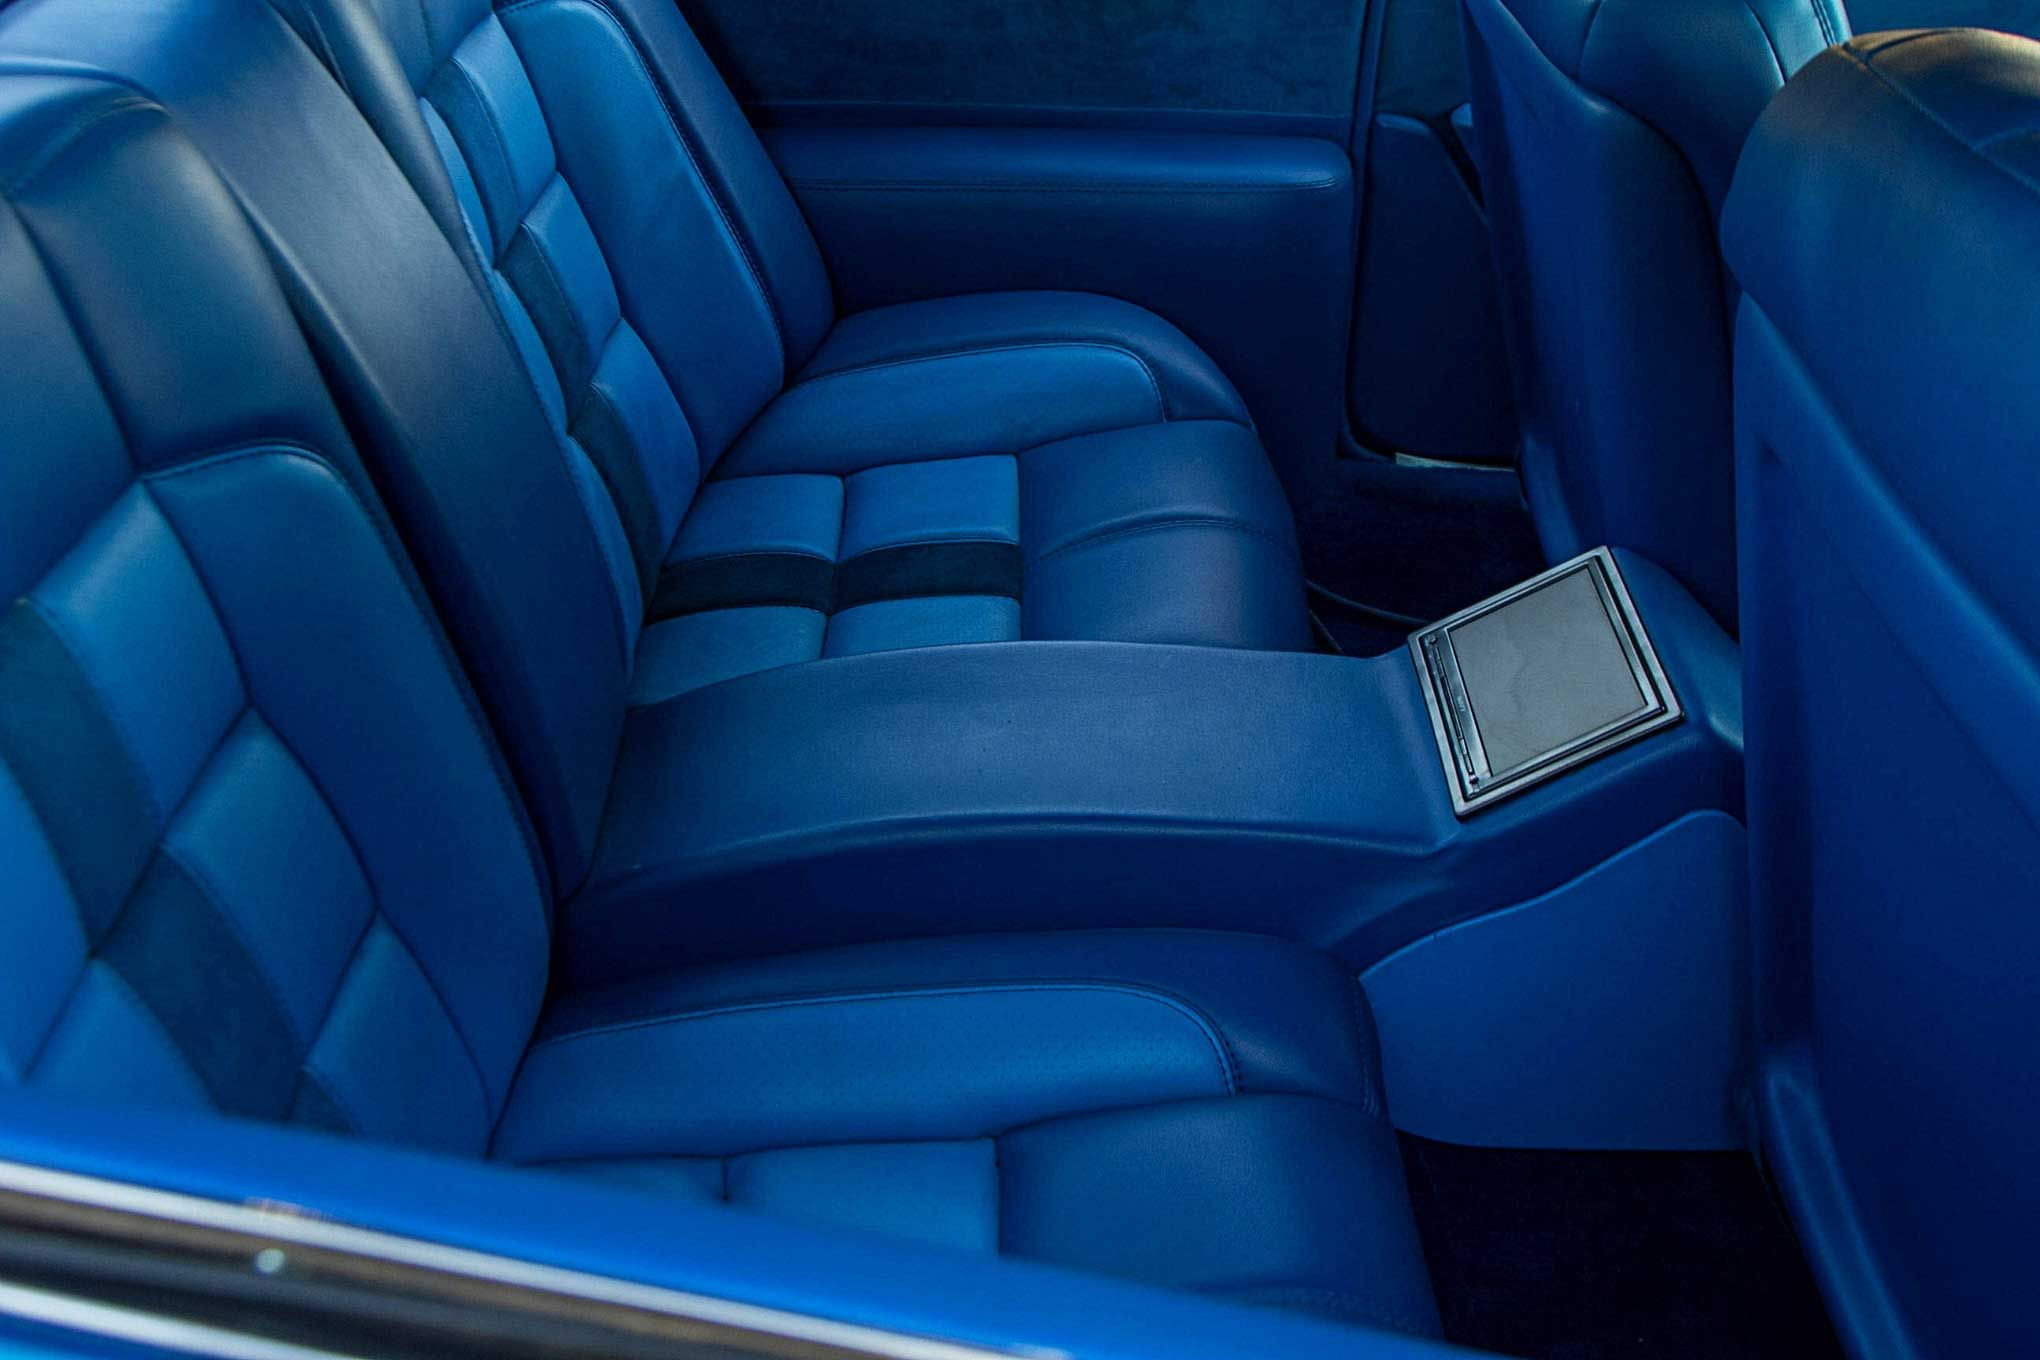 1968 Chevrolet Impala Fastback Rear Center Console Lowrider Chevrolet Impala Impala Chevy For Sale